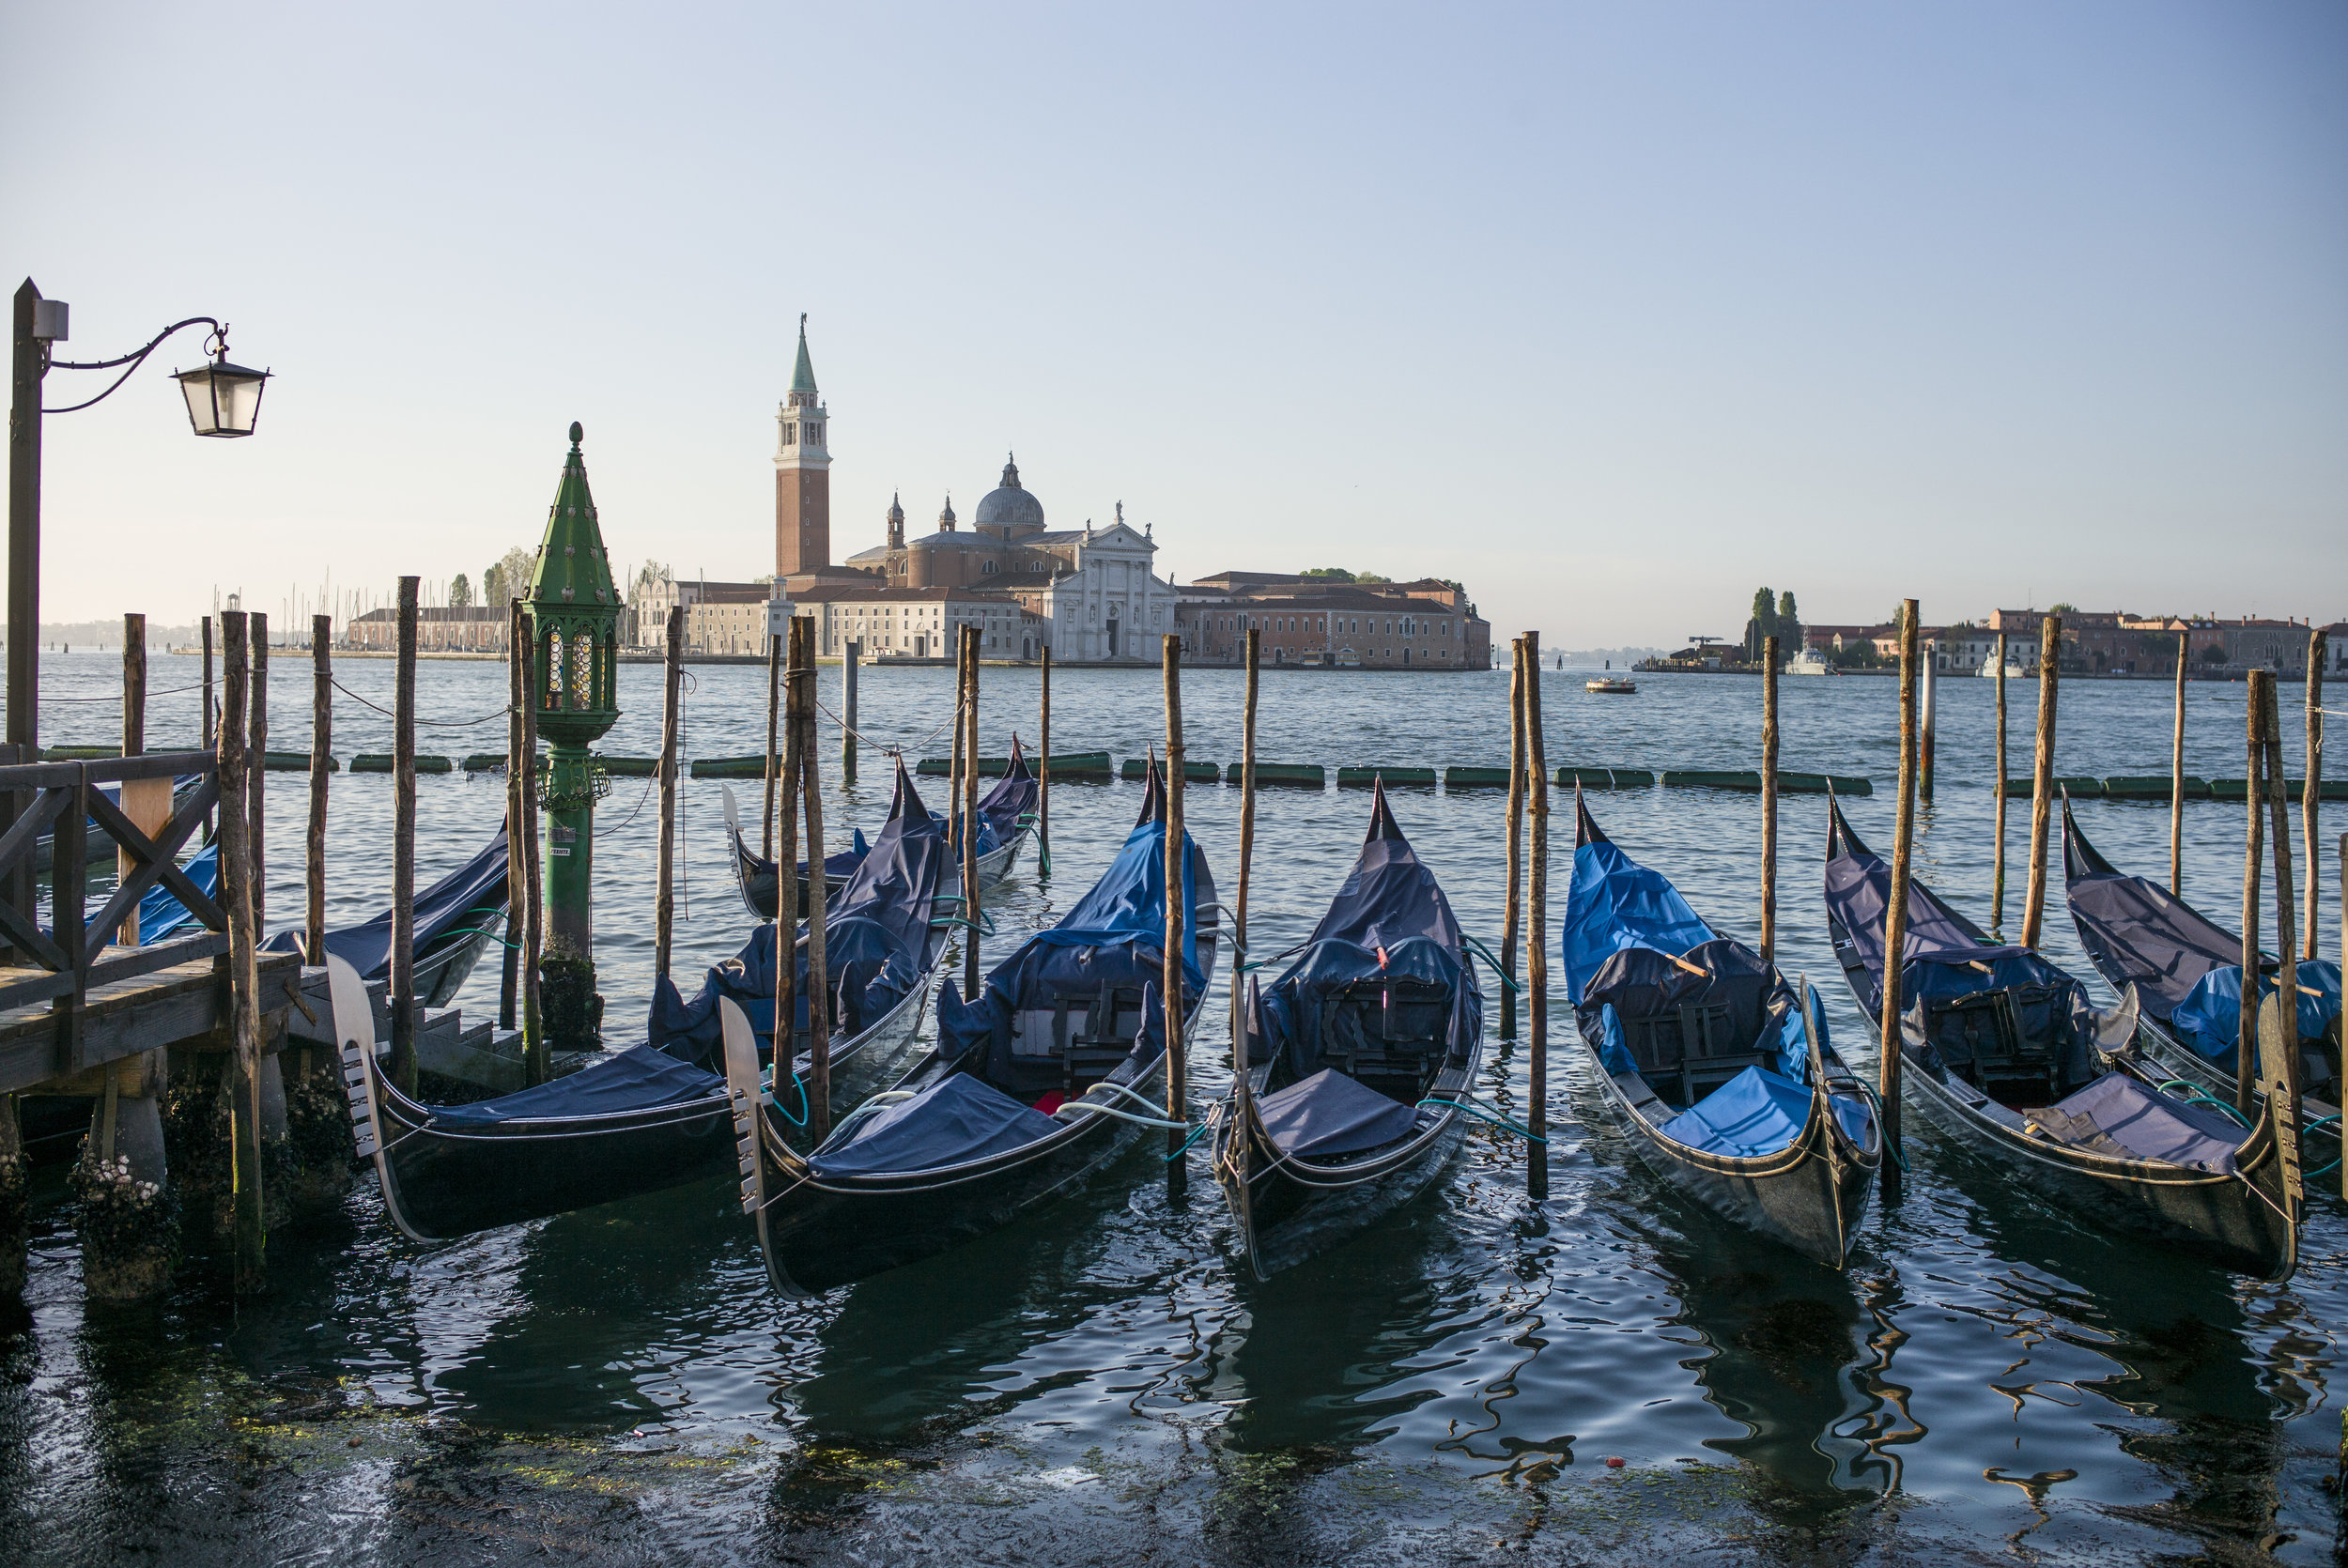 Gondolas in the morning sun at San Marco